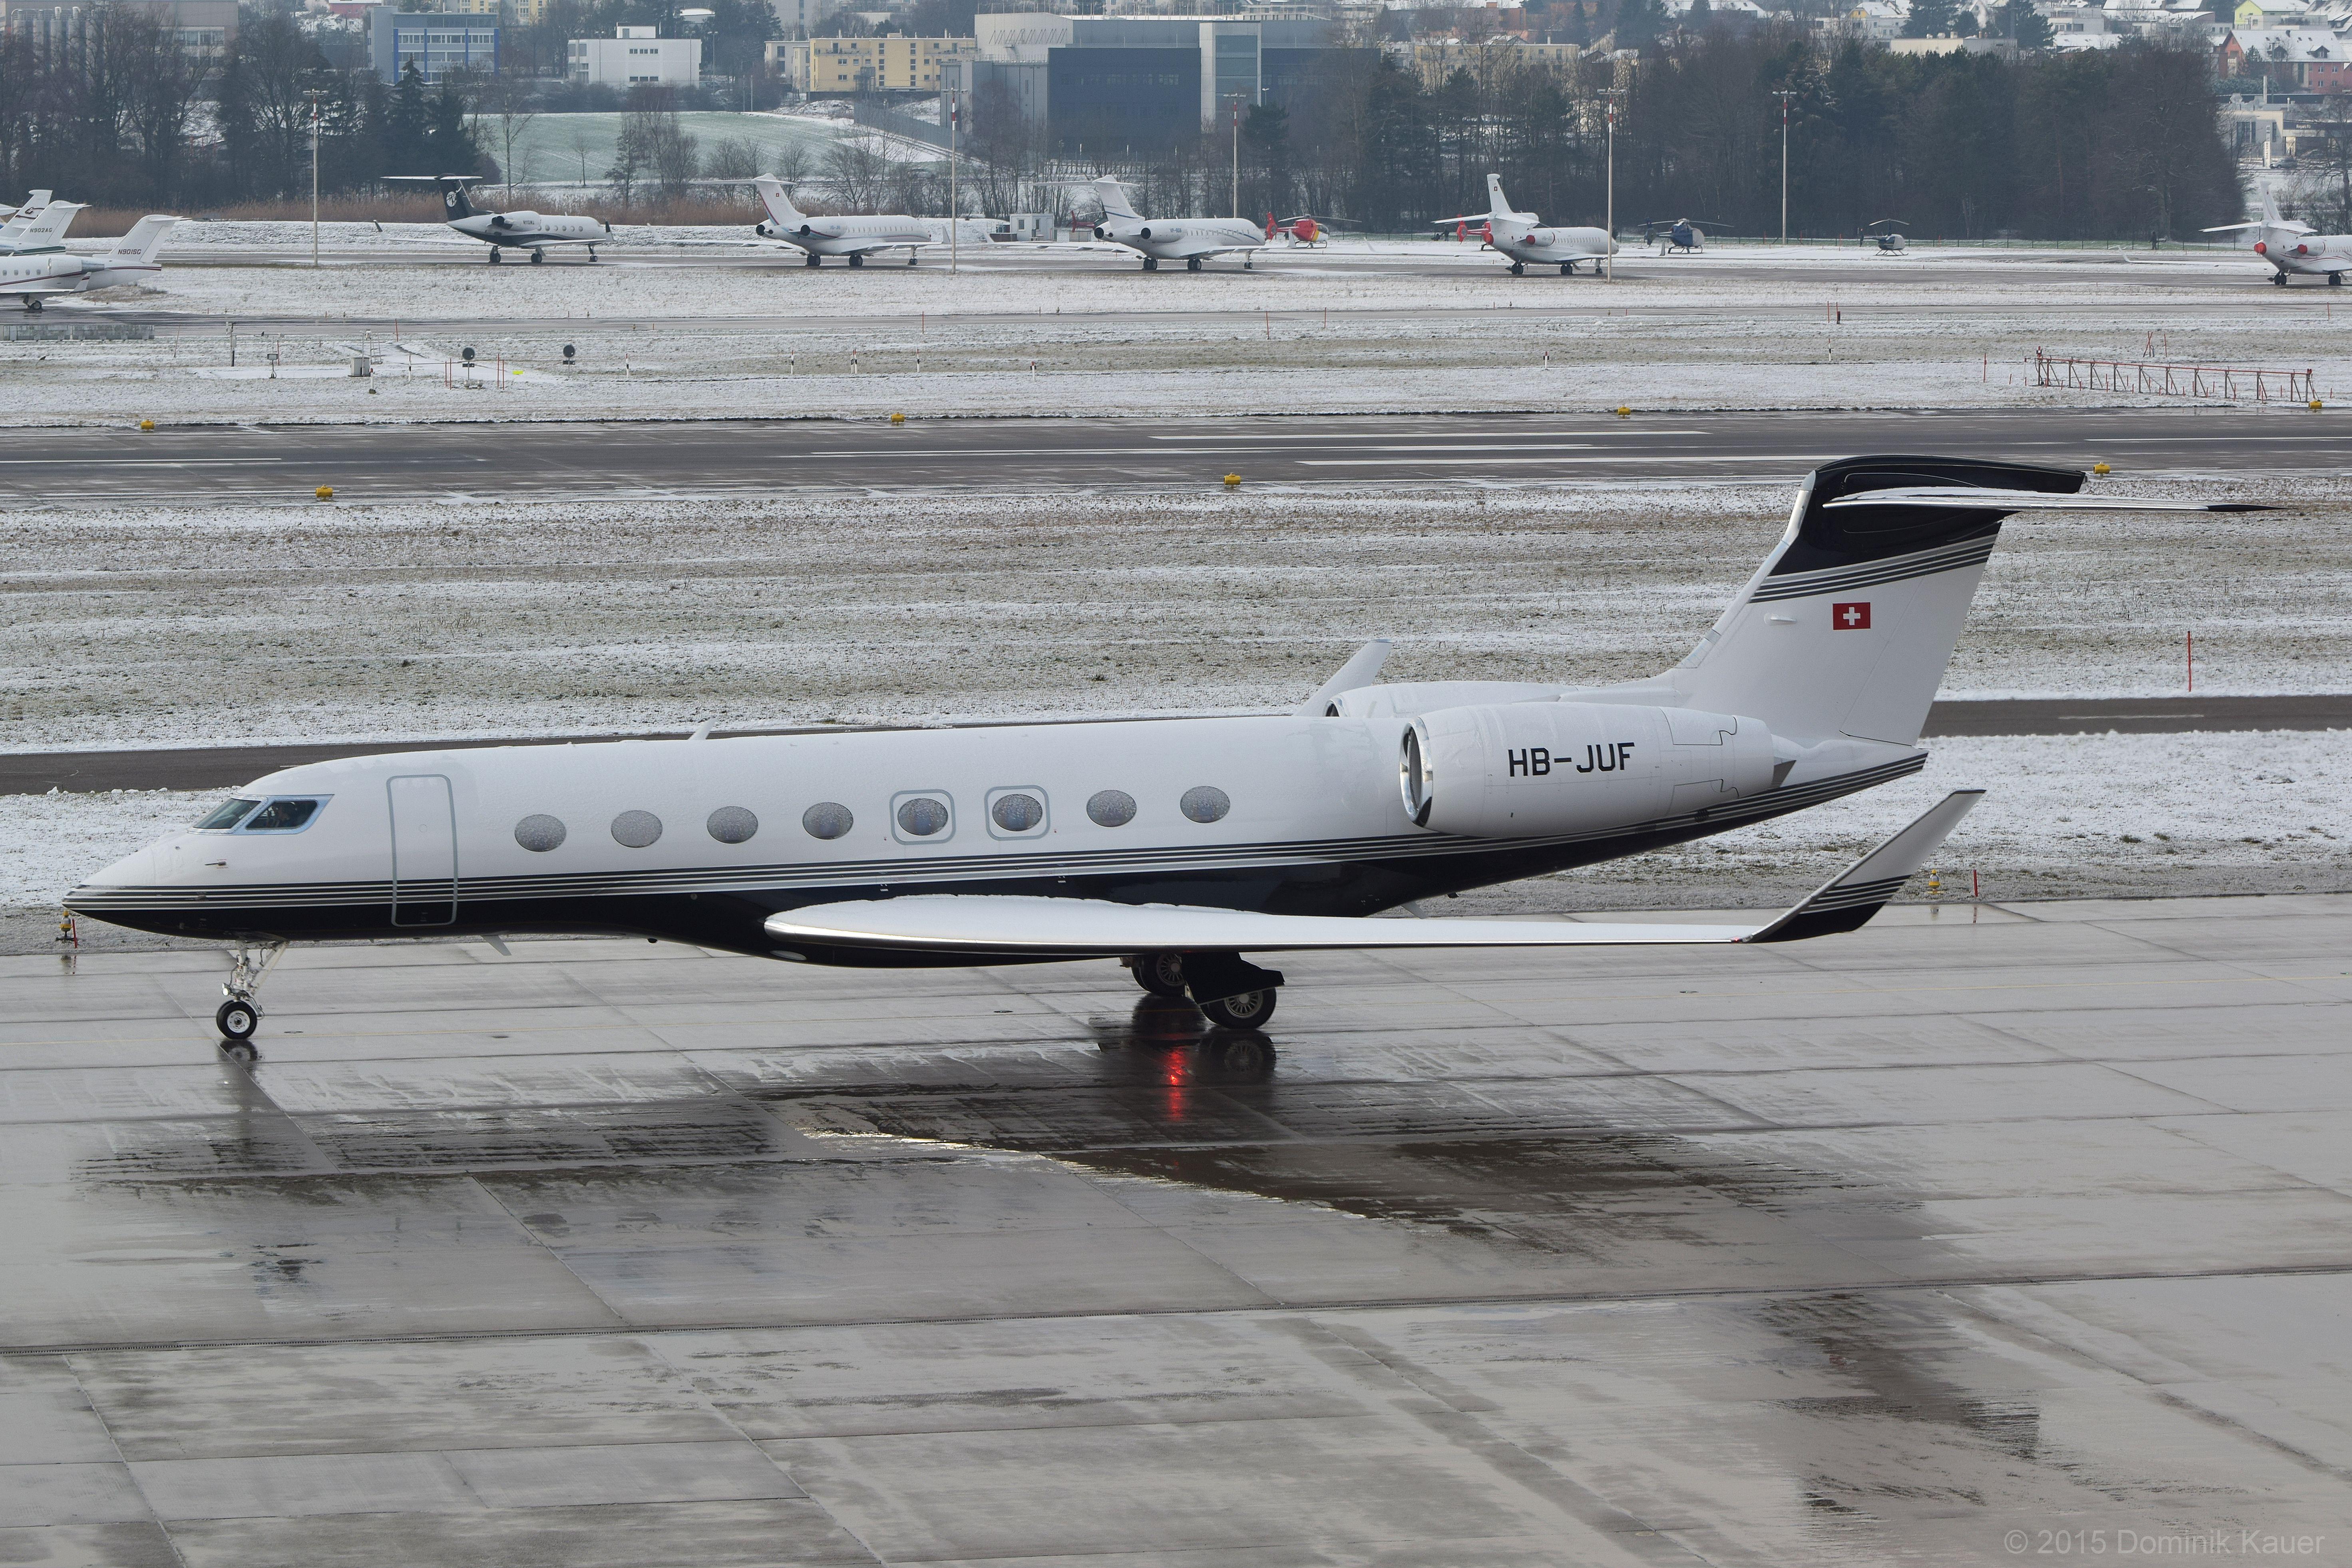 file swiss jet ag gulfstream gvi g650 hb juf zrh 24148065550 rh commons wikimedia org gulfstream g650 flight manual pdf gulfstream g650 flight manual